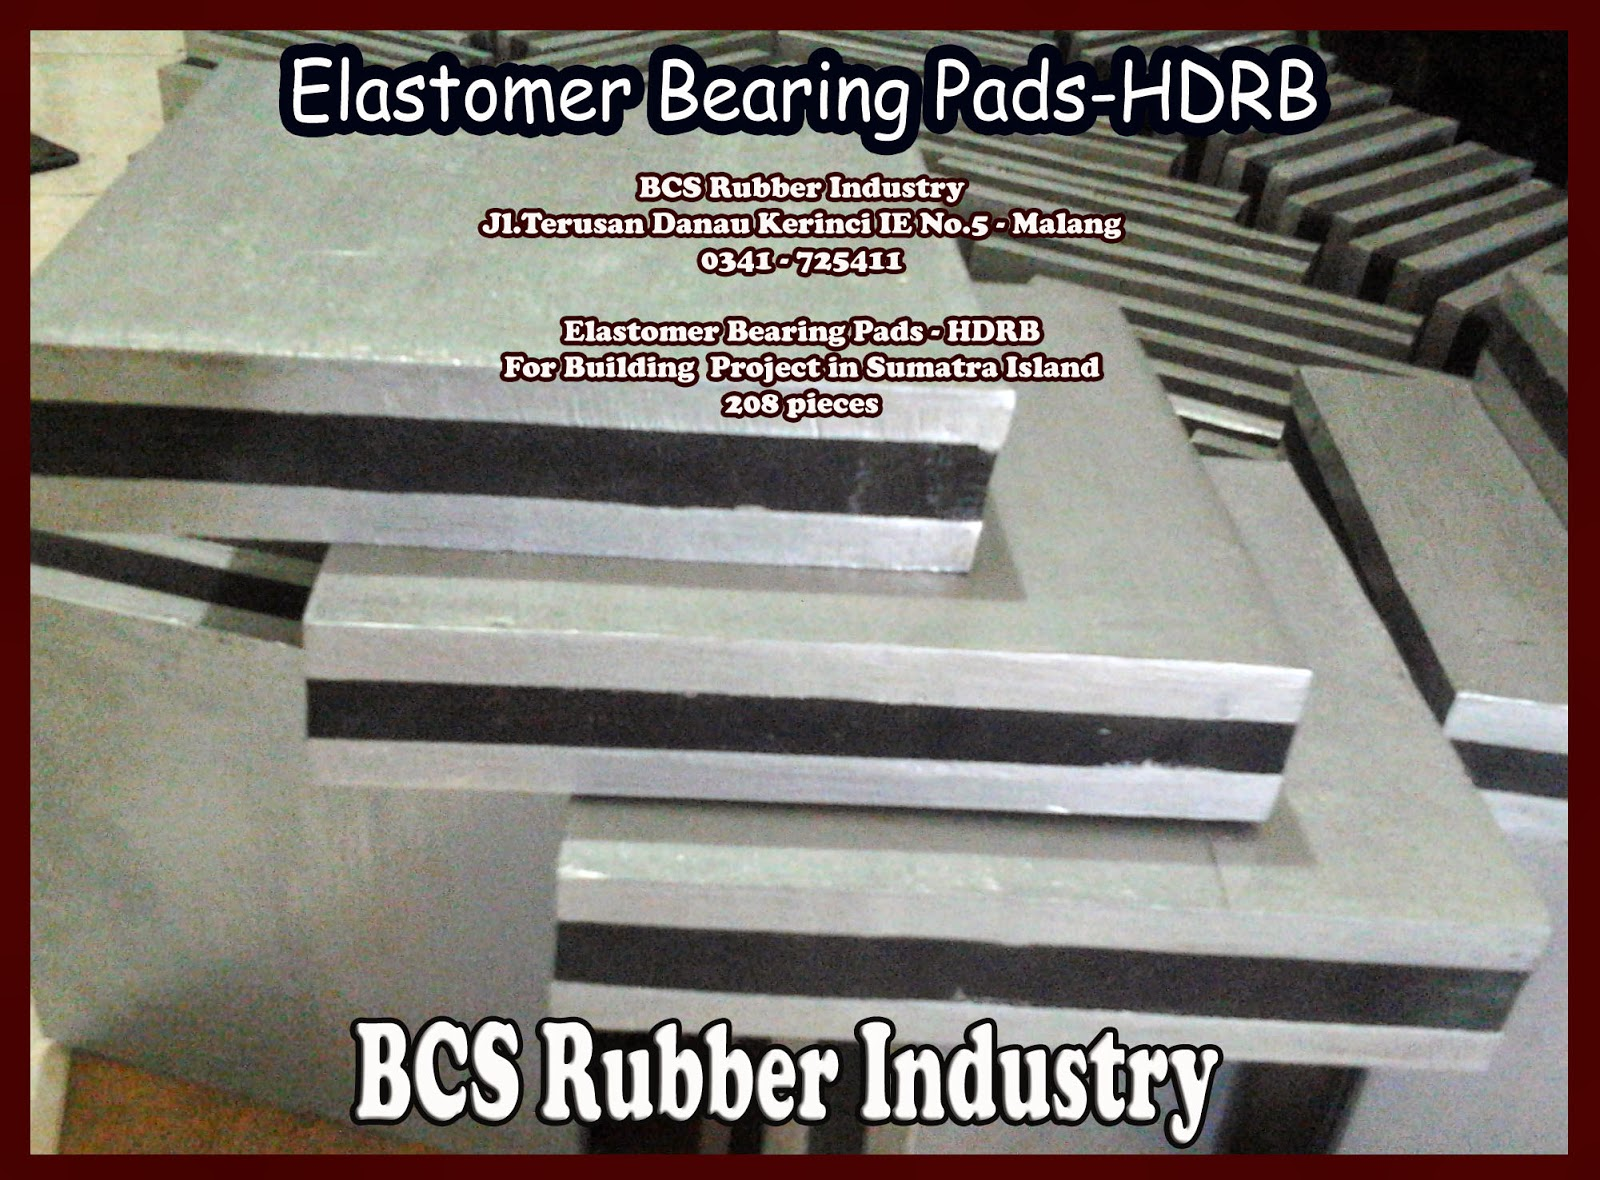 """""Bantalan Jembatan Banjarmasin""""Elastomer bearing Pads Batam""""Elastomer earing Pads Bandar Lampung""""Elastomer Bearing pads Bengkulu""""Elastomer Bearing Pds Denpasar"""""